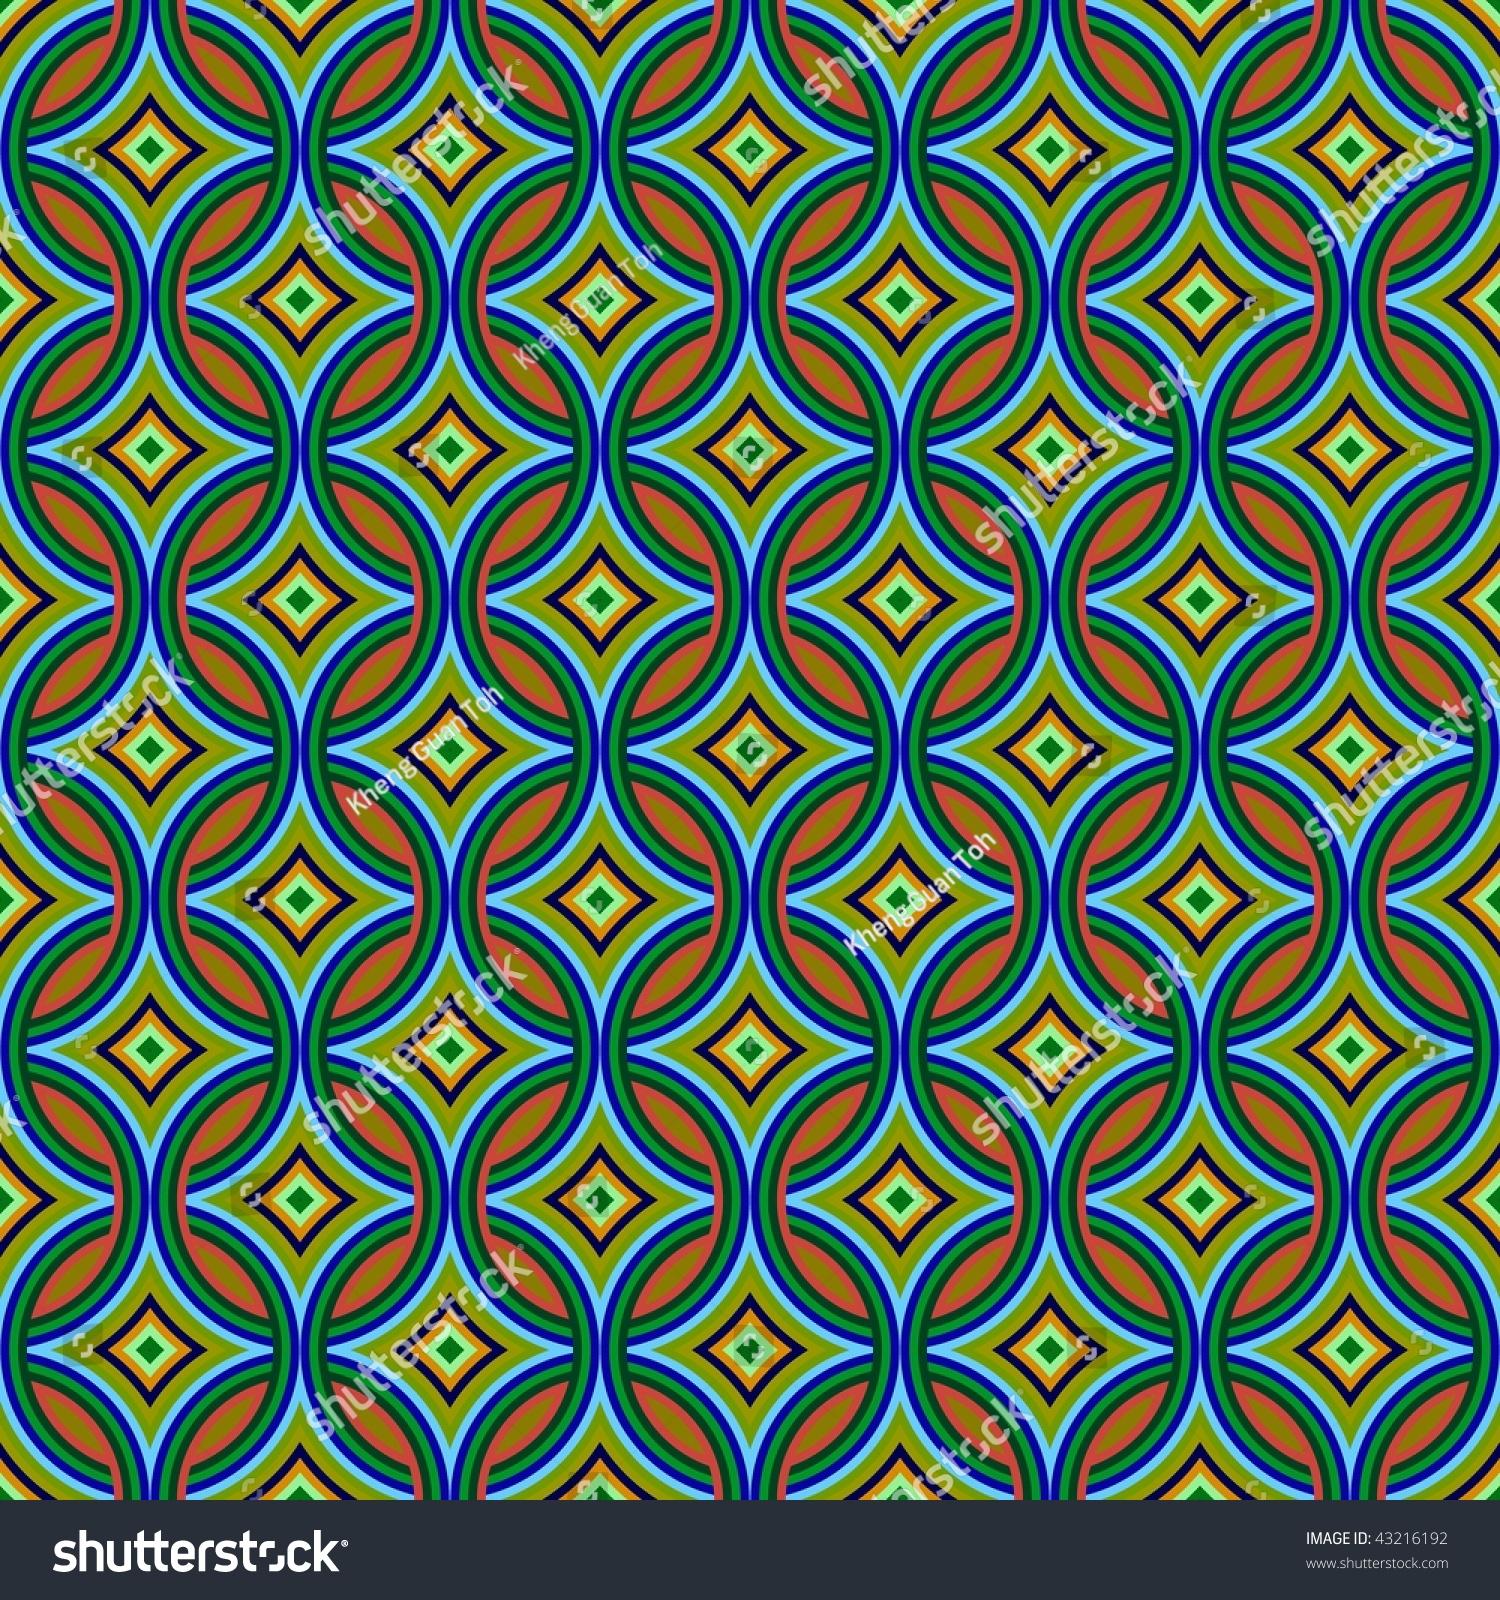 Colorful vintage background patterns - photo#14